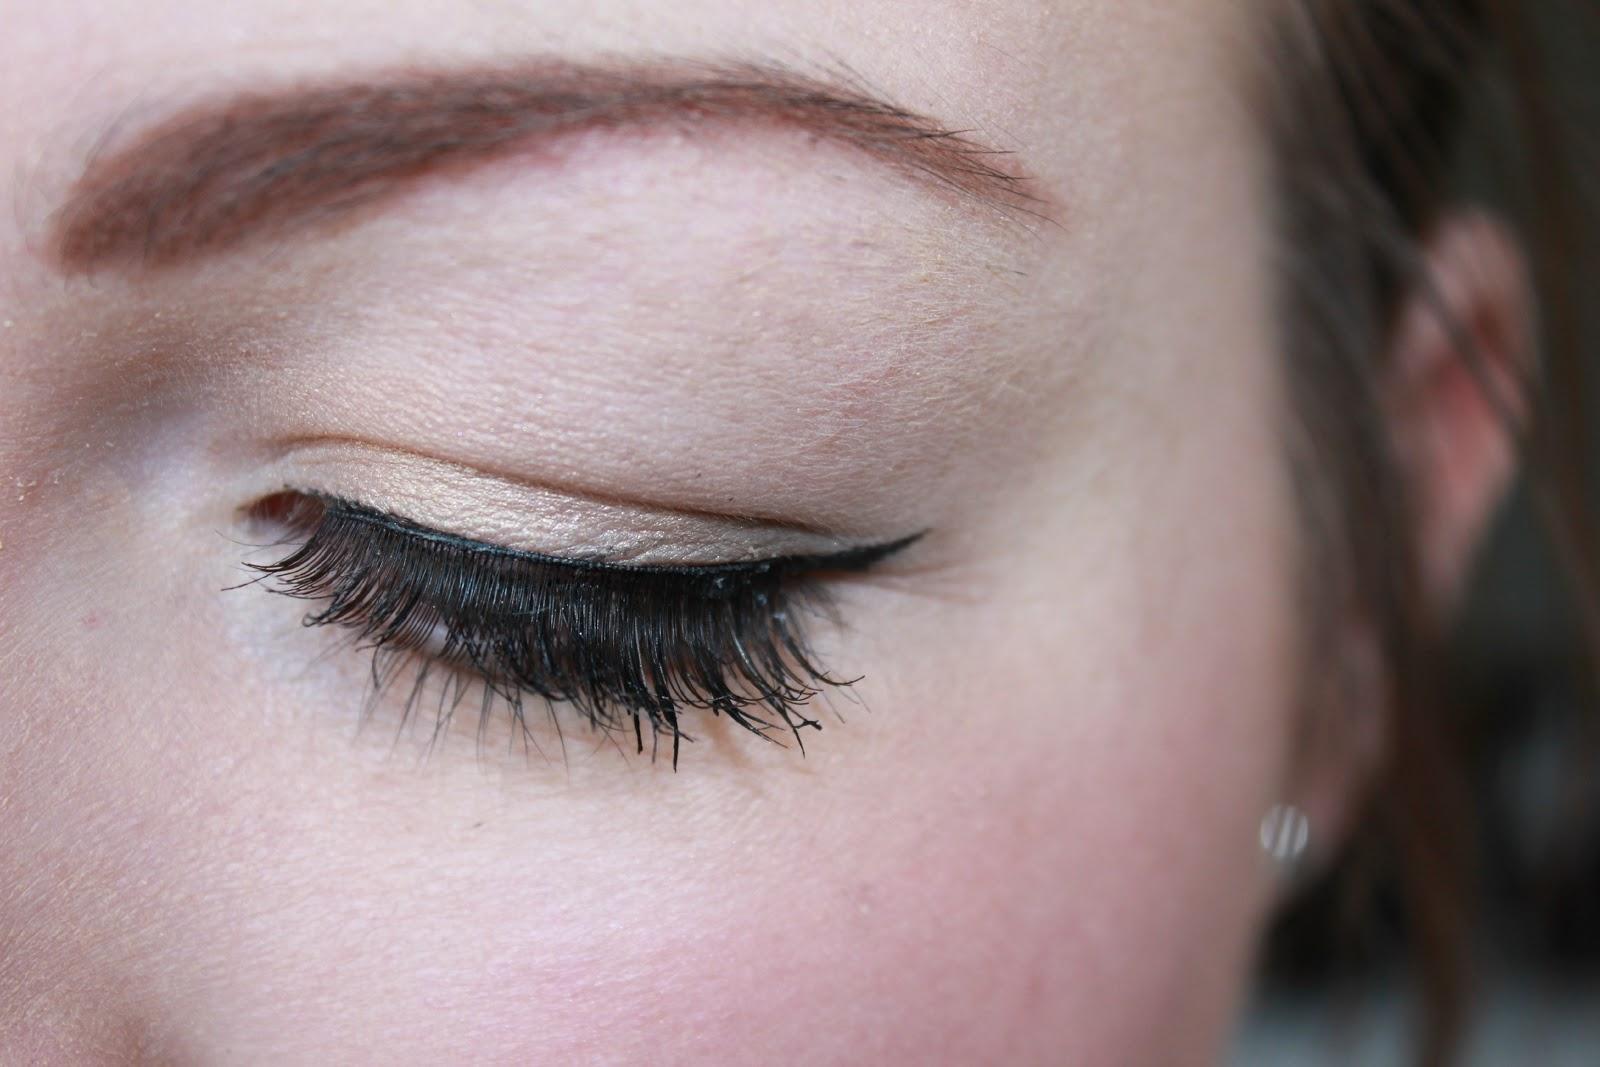 Eylure Naturalite False Eyelashes 070 Review | Brogan Tate